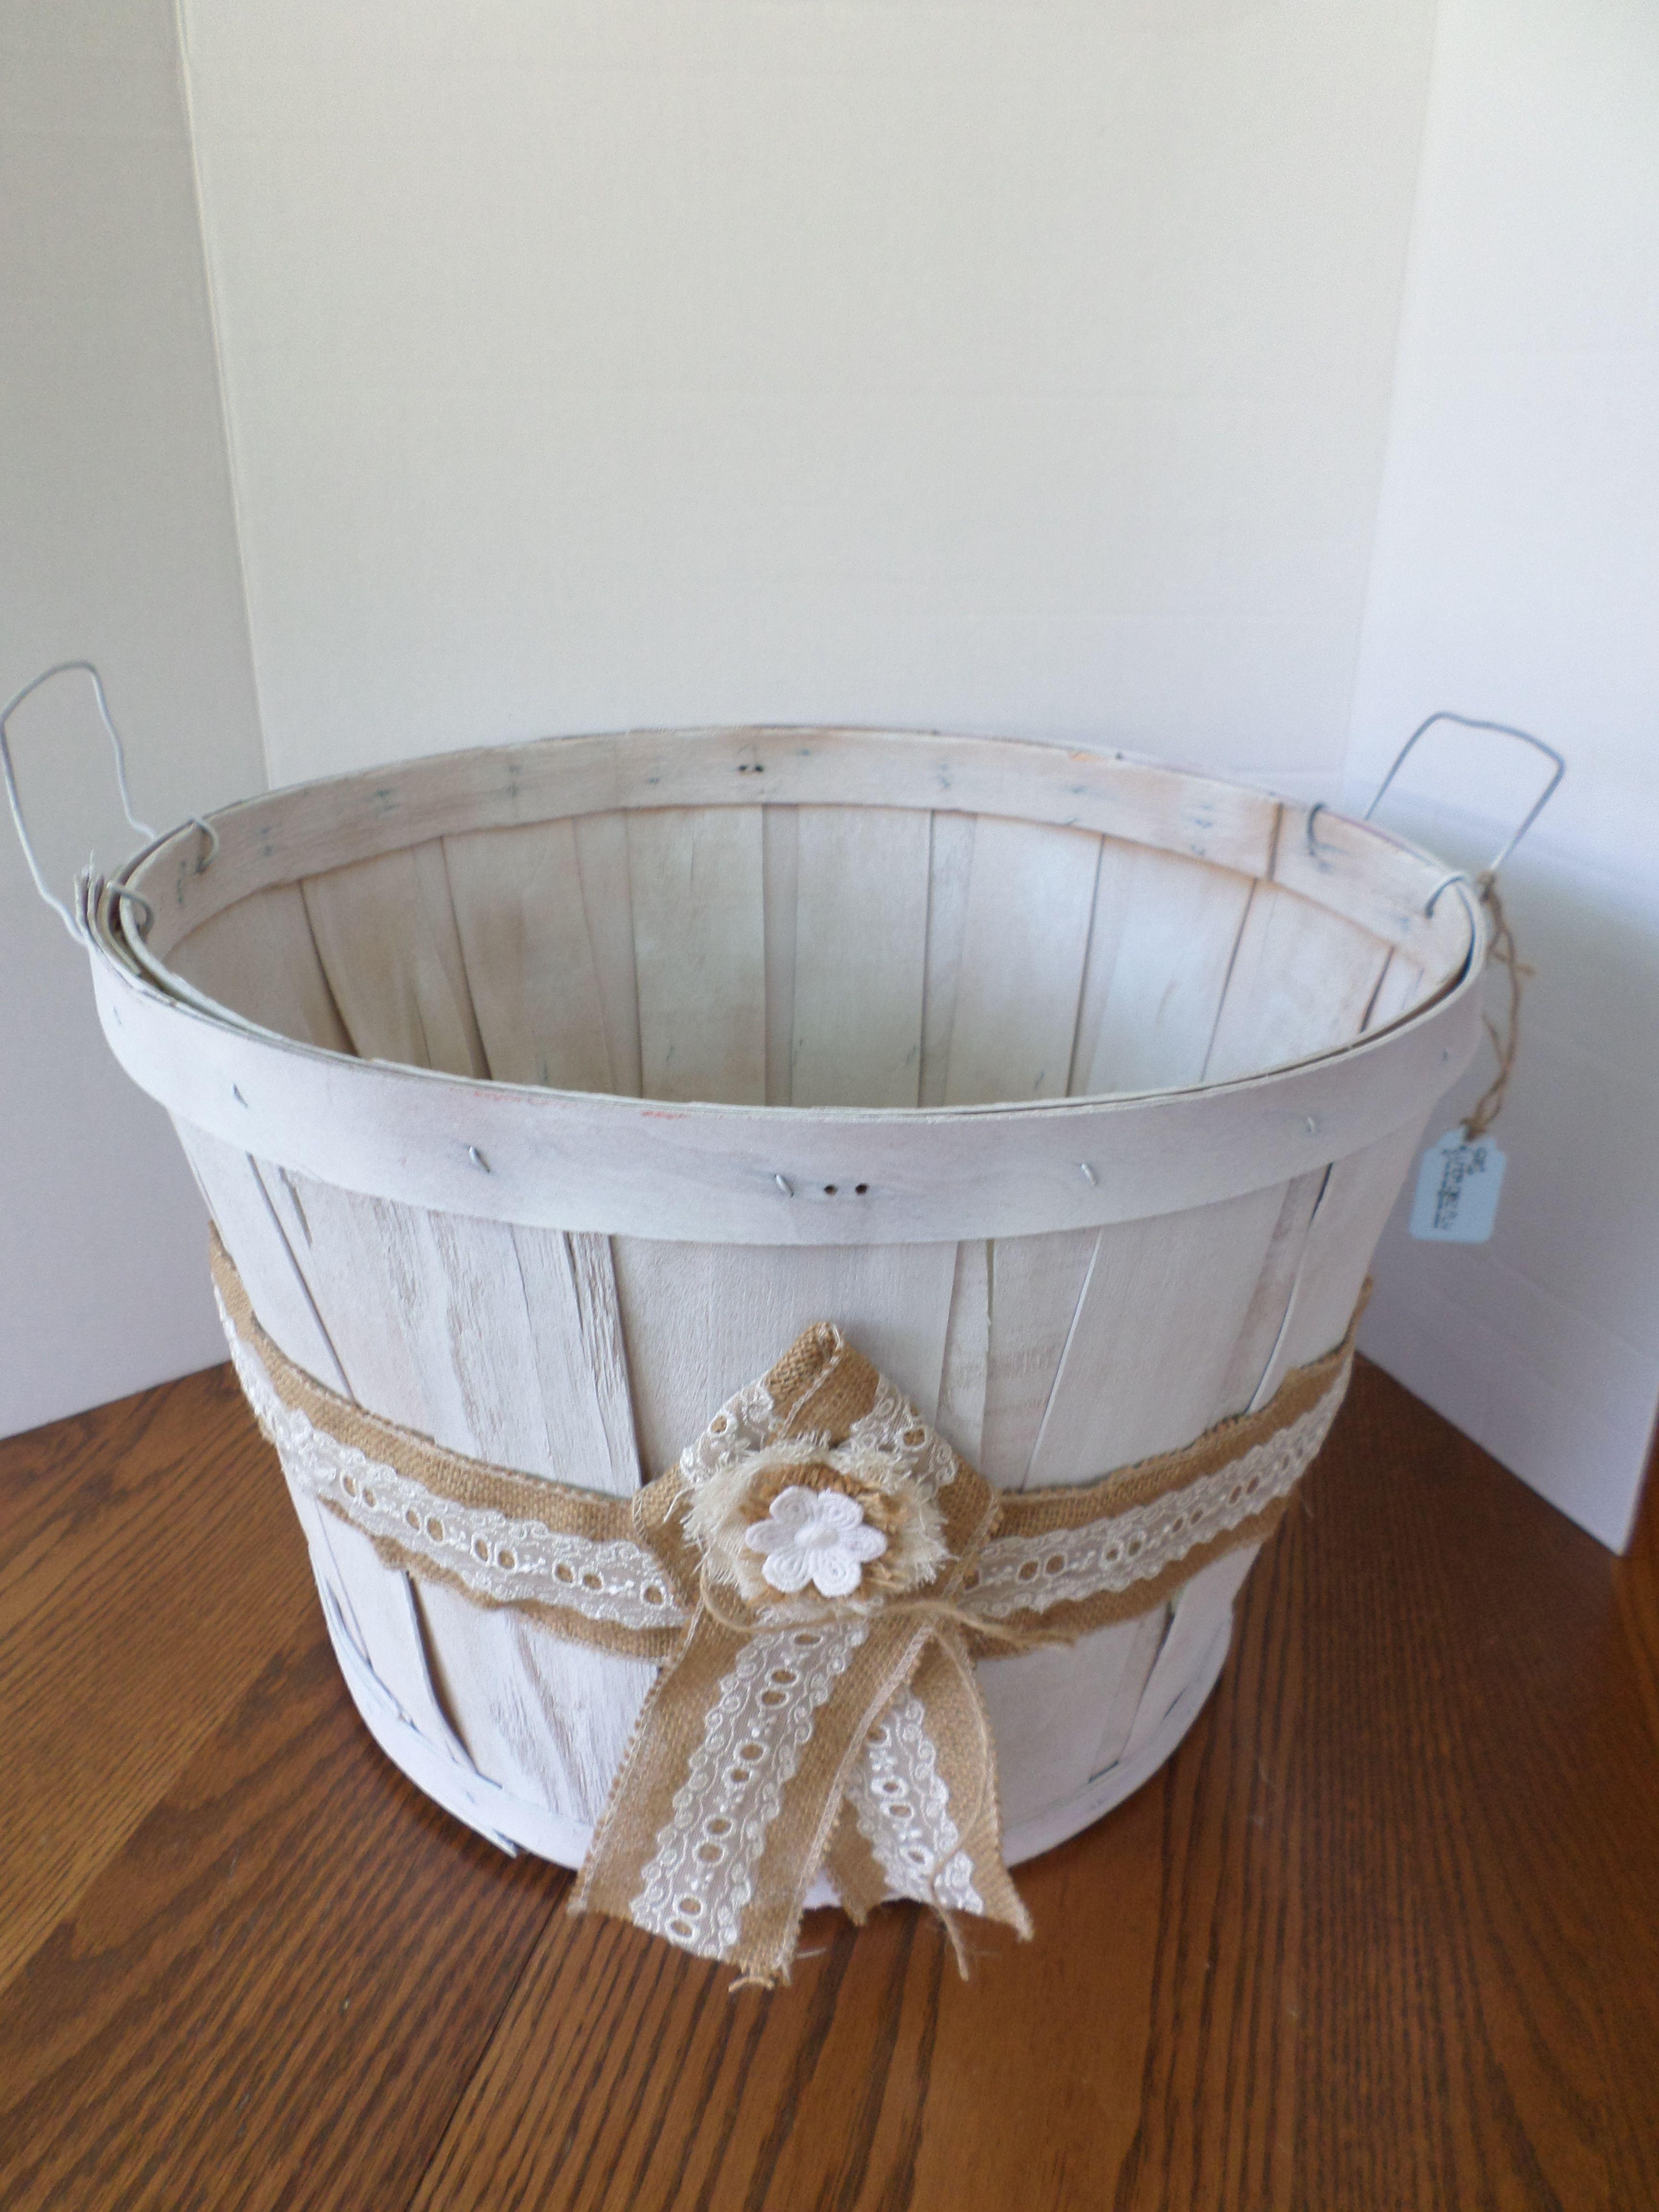 Upcycled Bushel Basket Handcrafted Repurposed Items Baskets Decoration